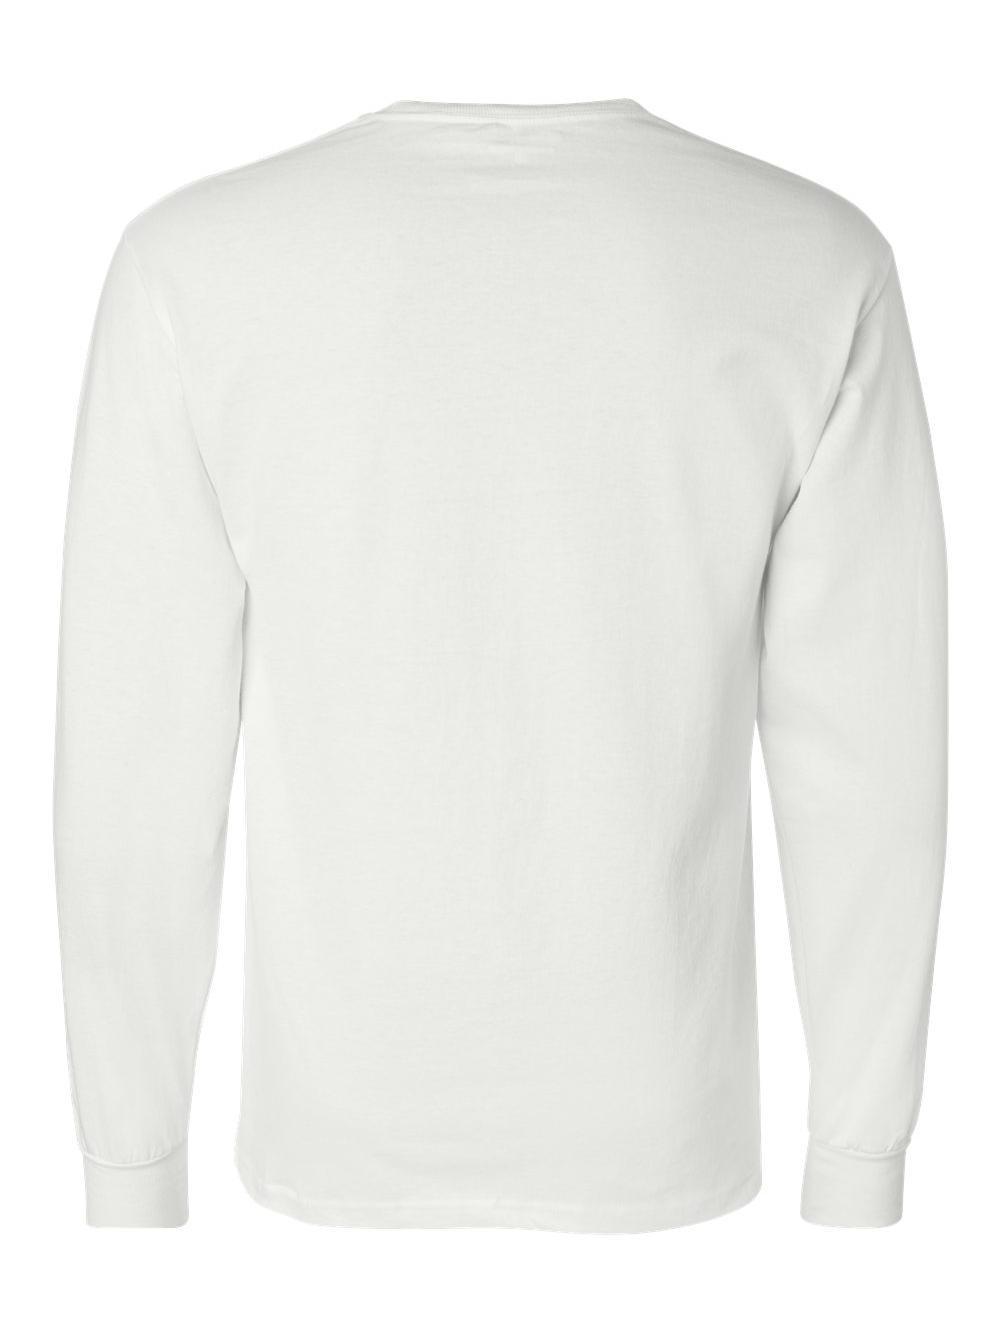 Champion-Long-Sleeve-T-Shirt-CC8C thumbnail 16